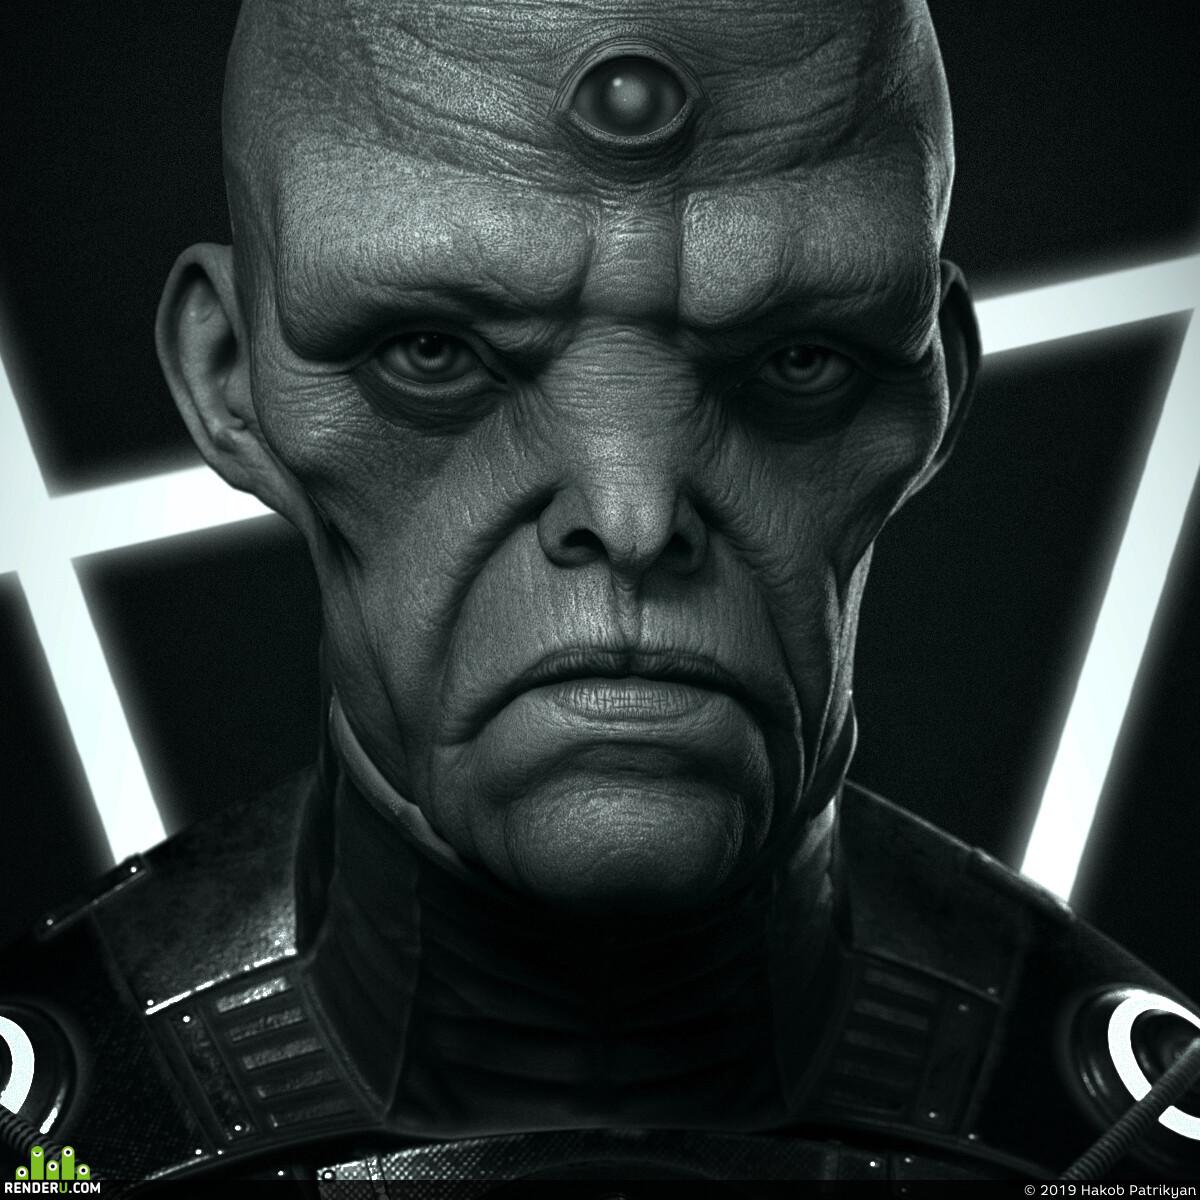 digital 3d, Characters, Concept Art, creatures, Mudbox, speedsculpt, hypnotizer, hypnotize, alien